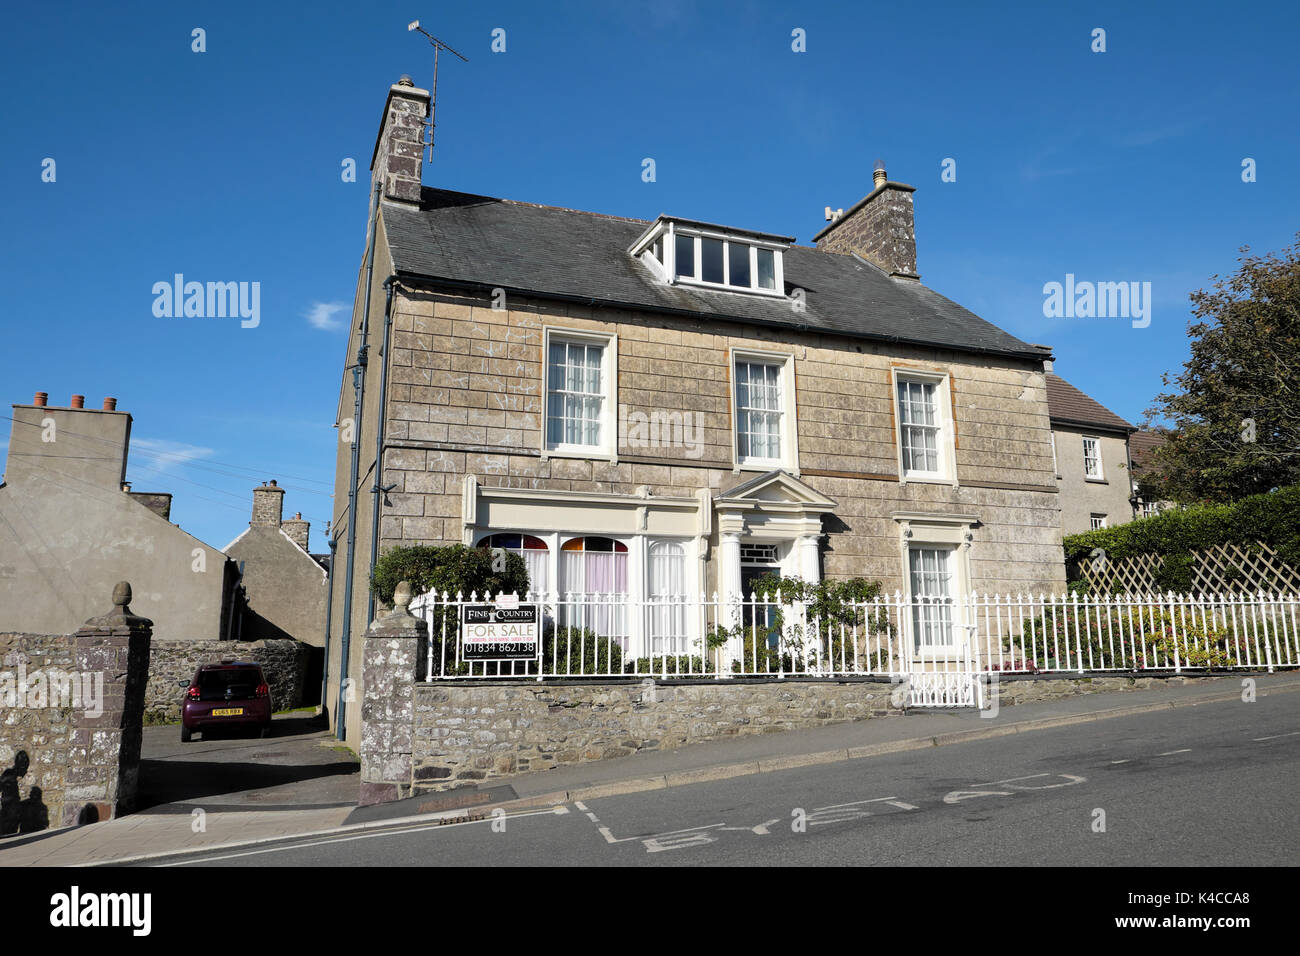 St Davids Wales Property For Sale